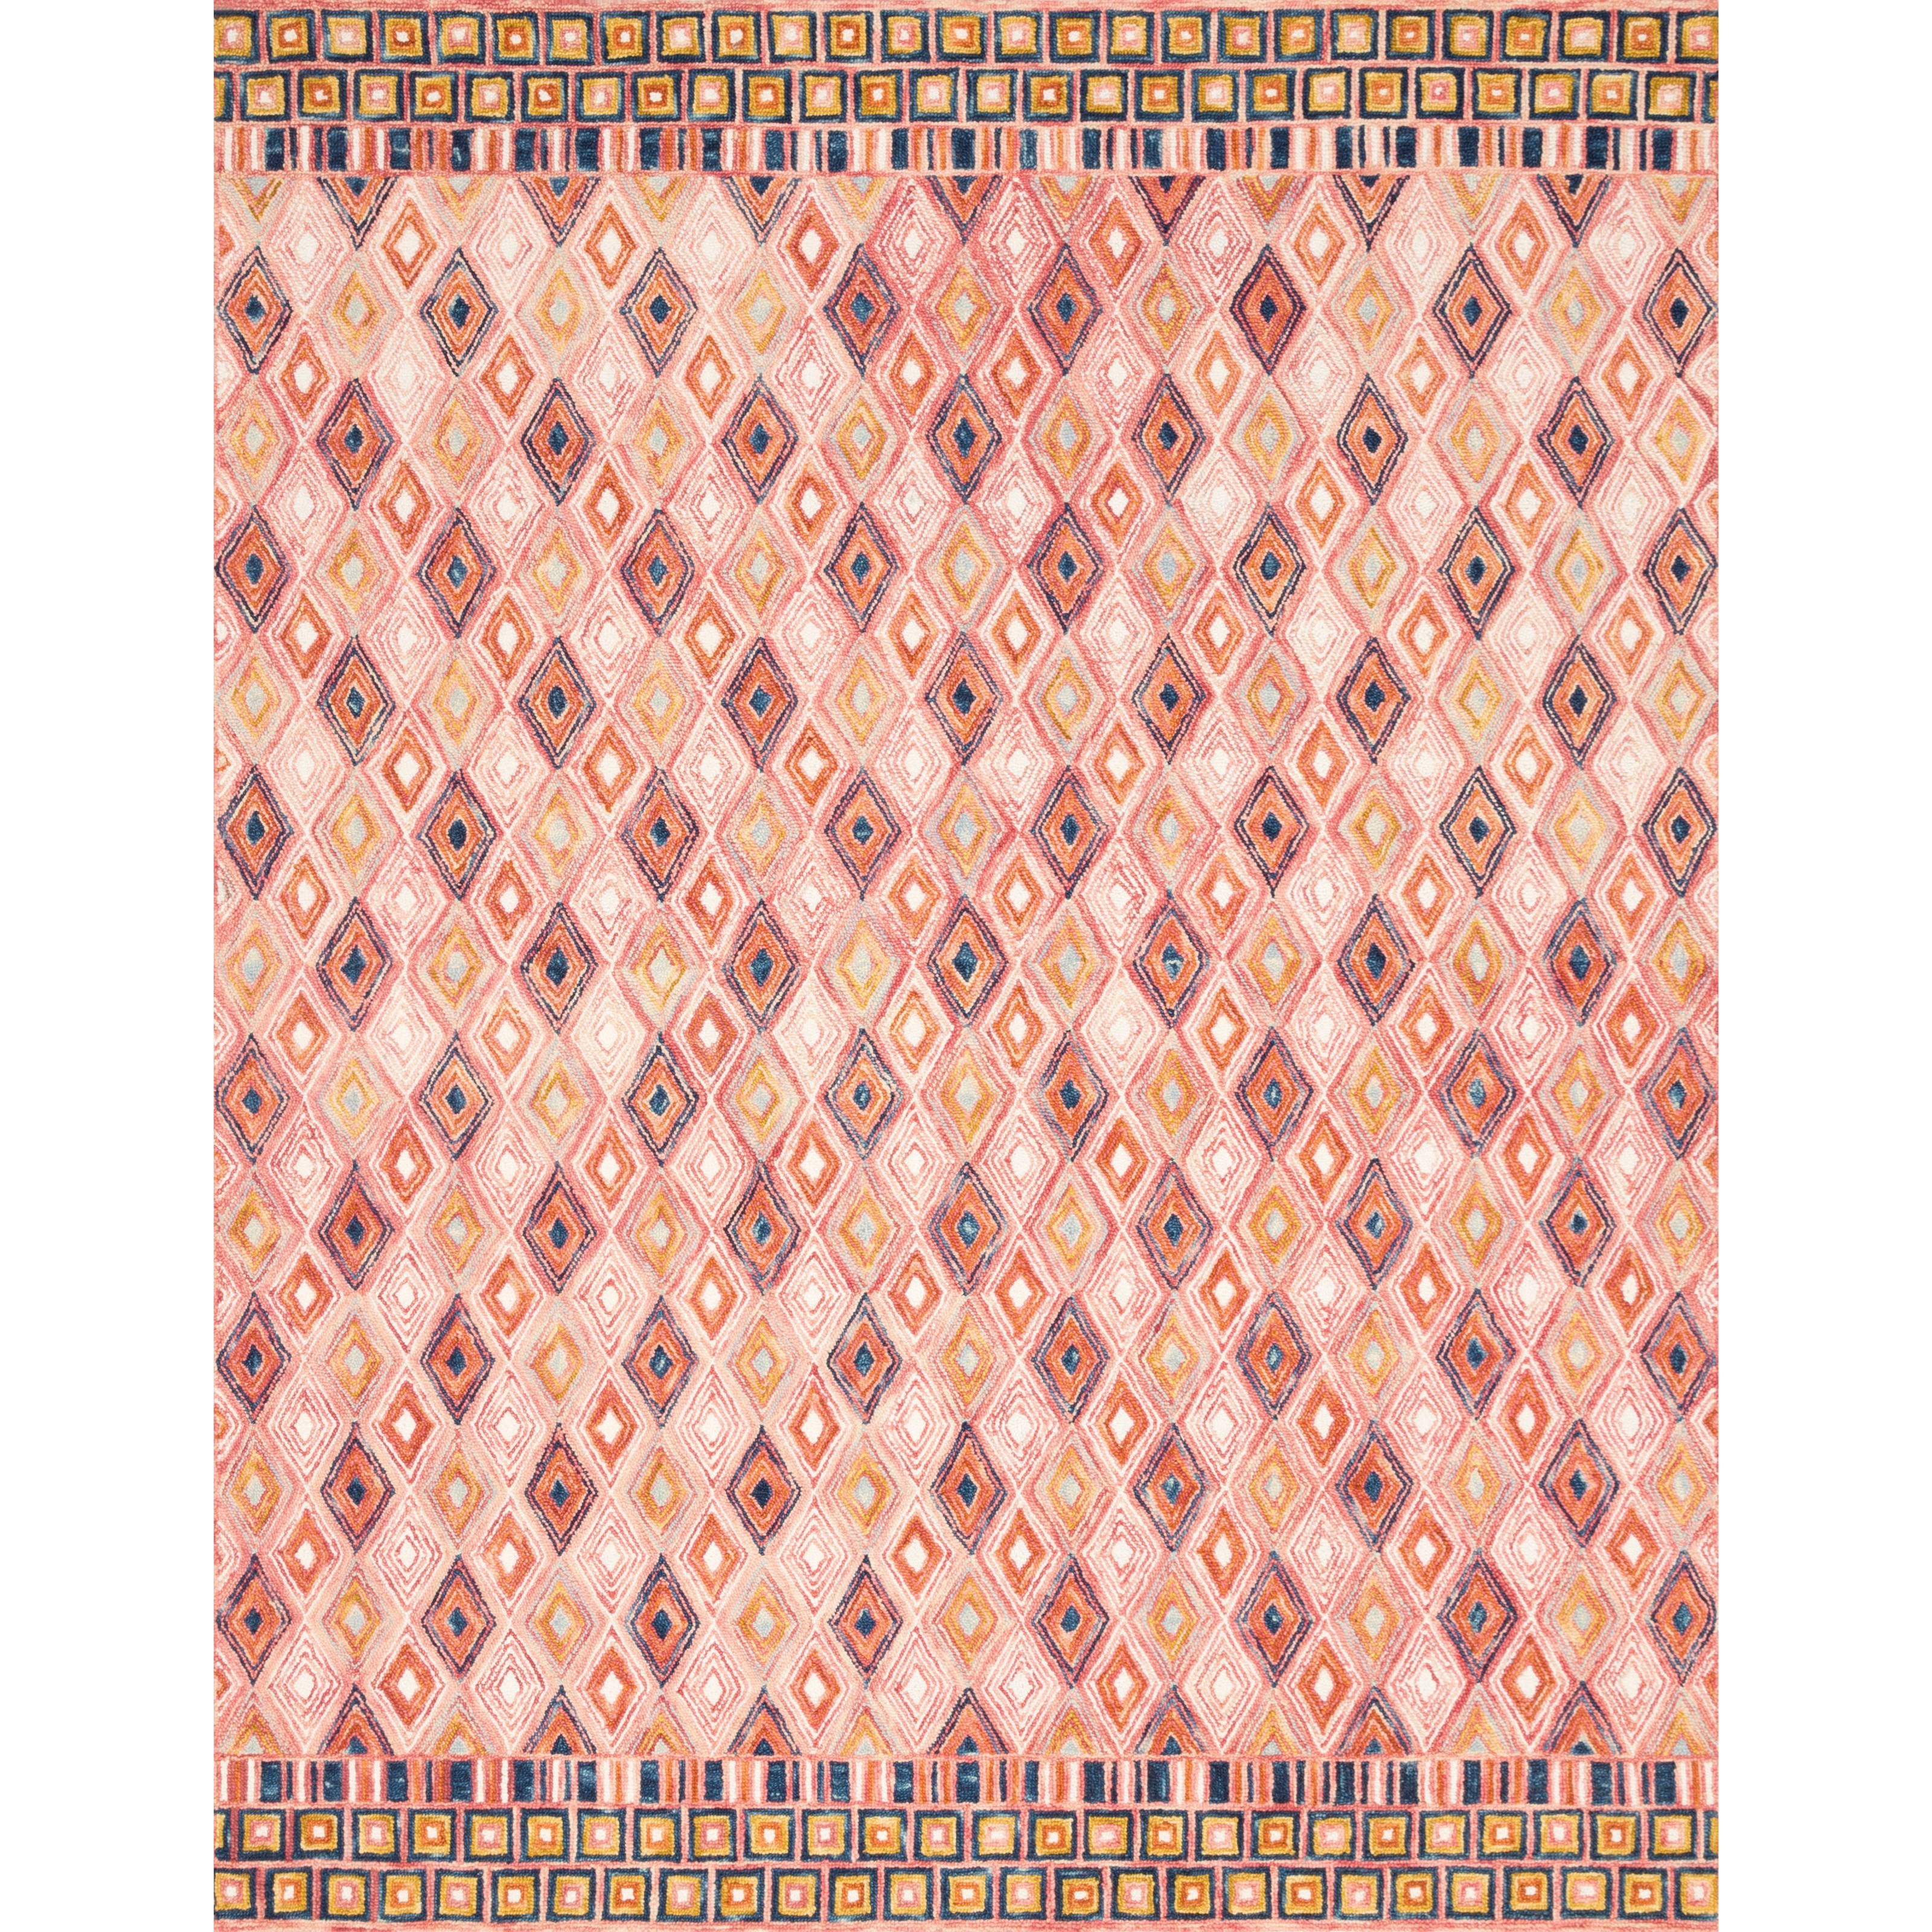 "Priti 7'9"" x 9'9"" Pink / Sunset Rug by Loloi Rugs at Virginia Furniture Market"